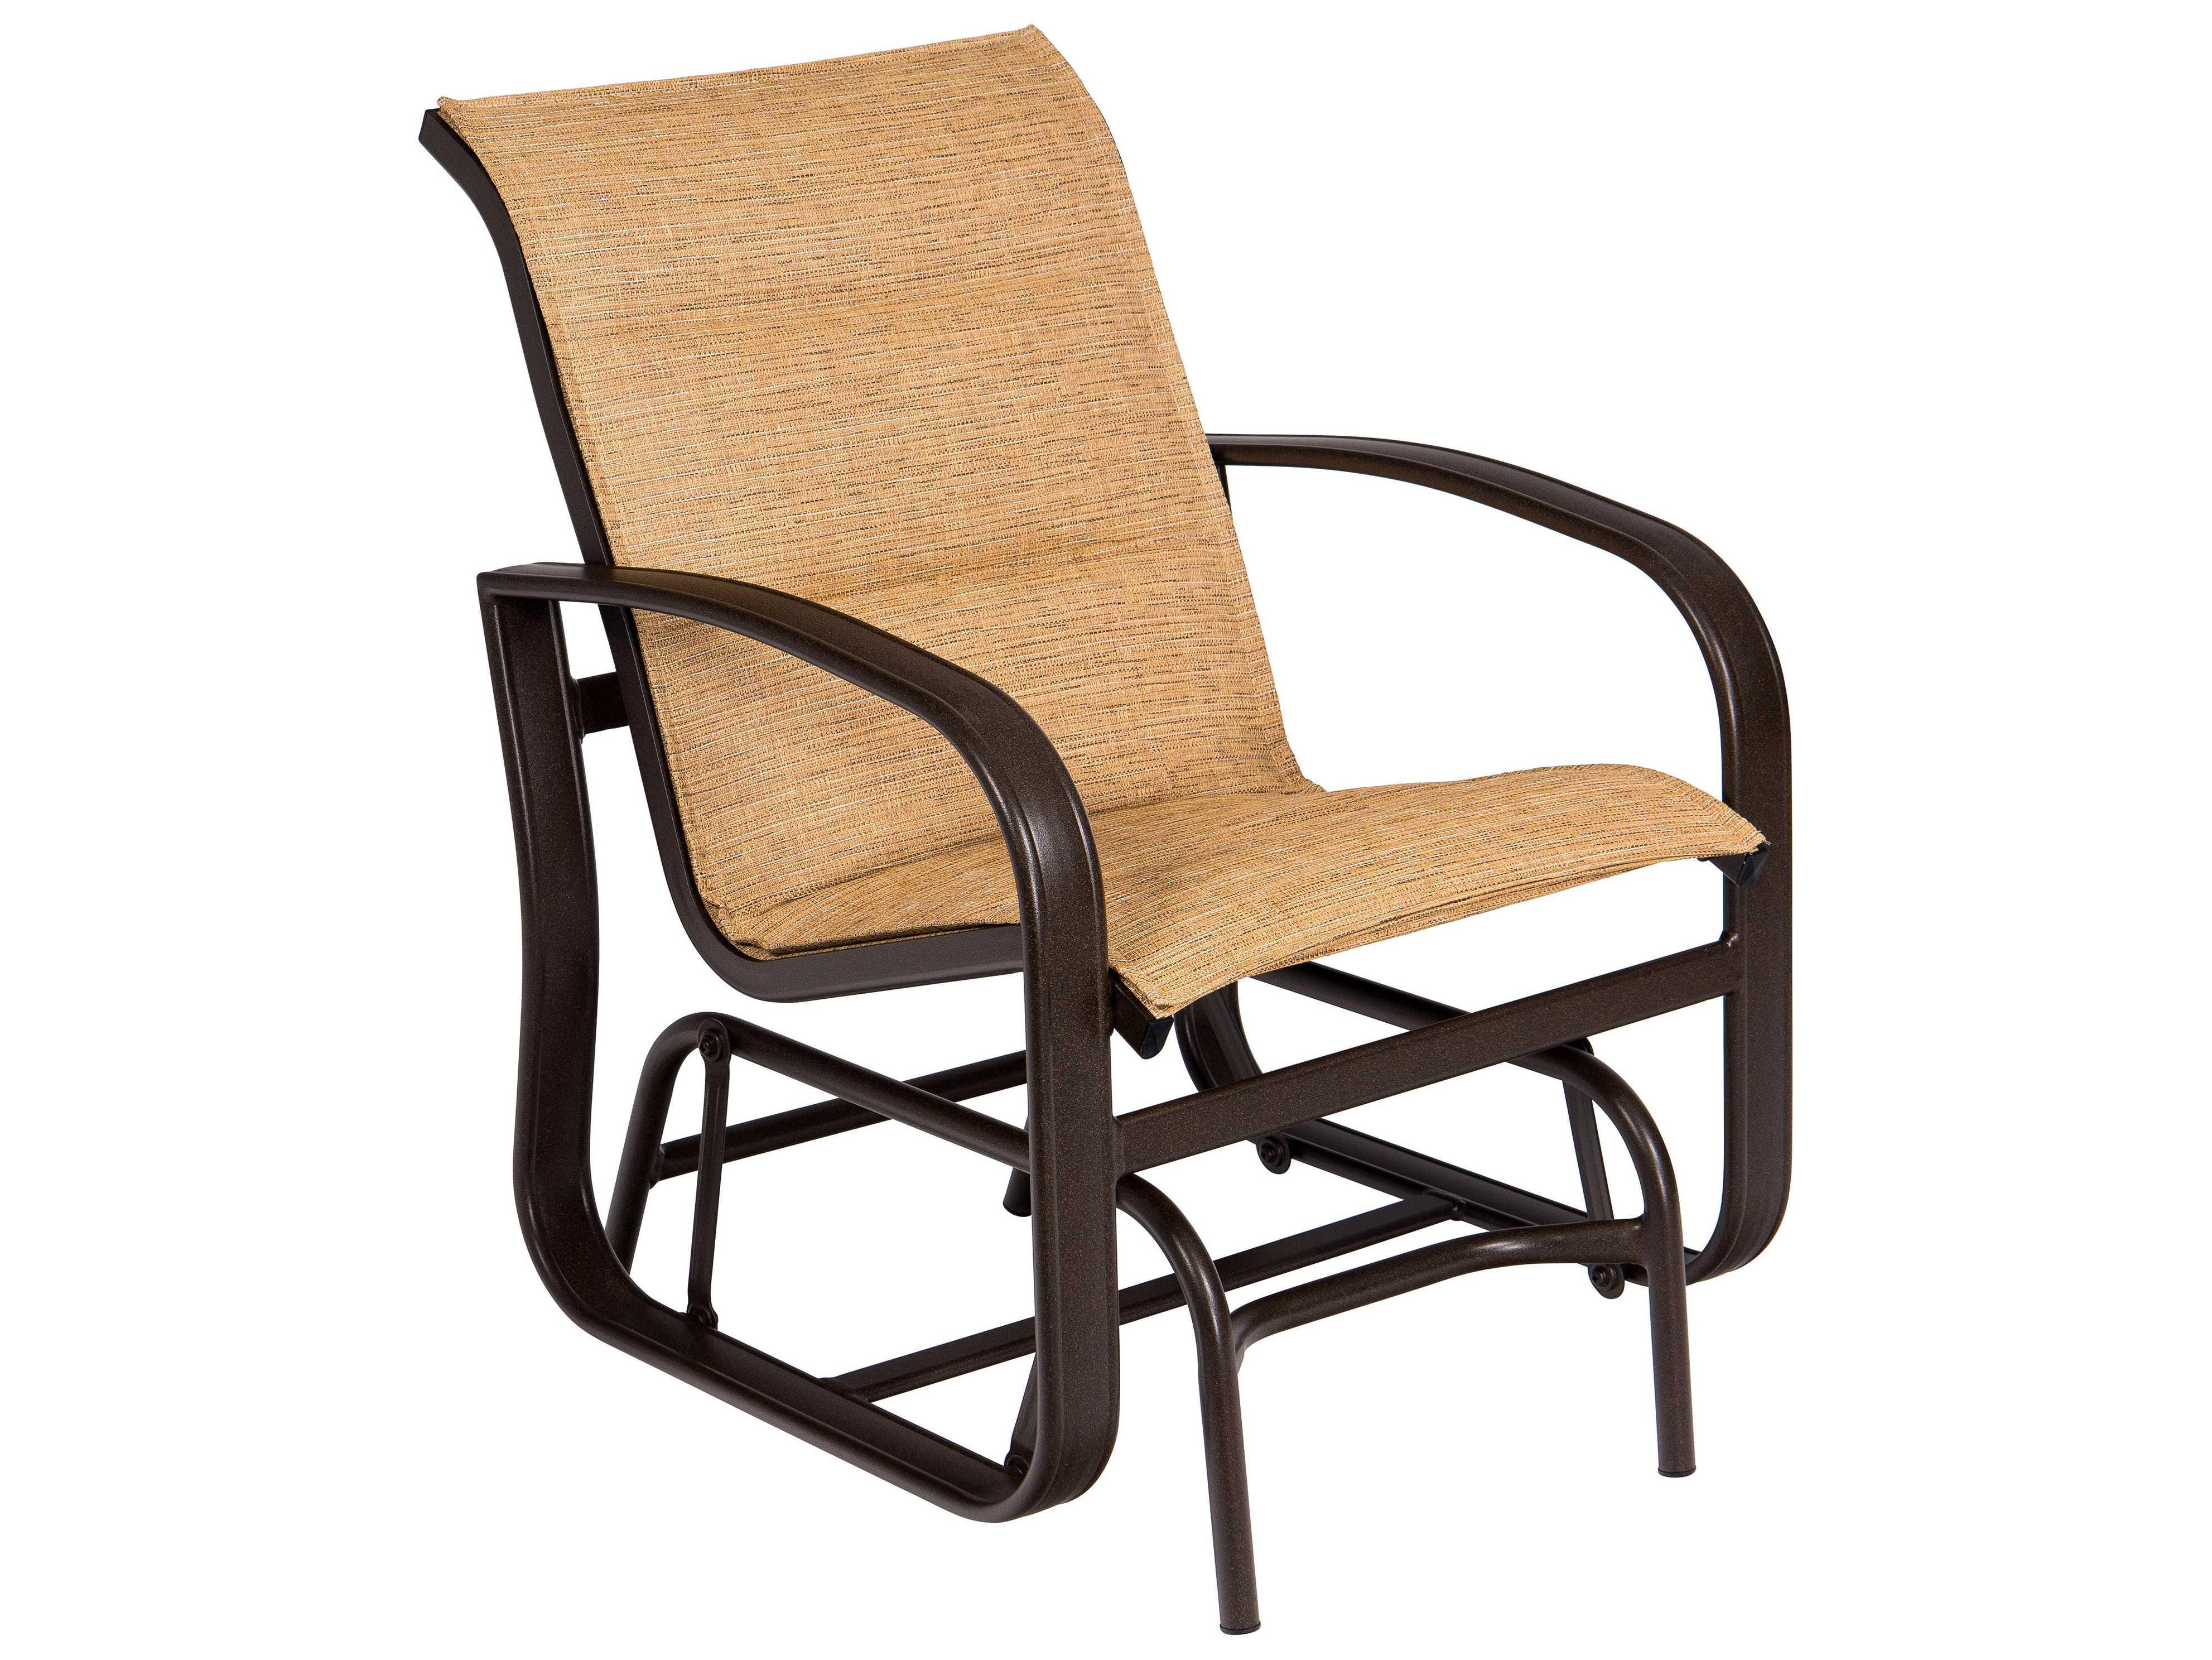 beach sling chair farm style chairs woodard cayman isle padded aluminum glider lounge